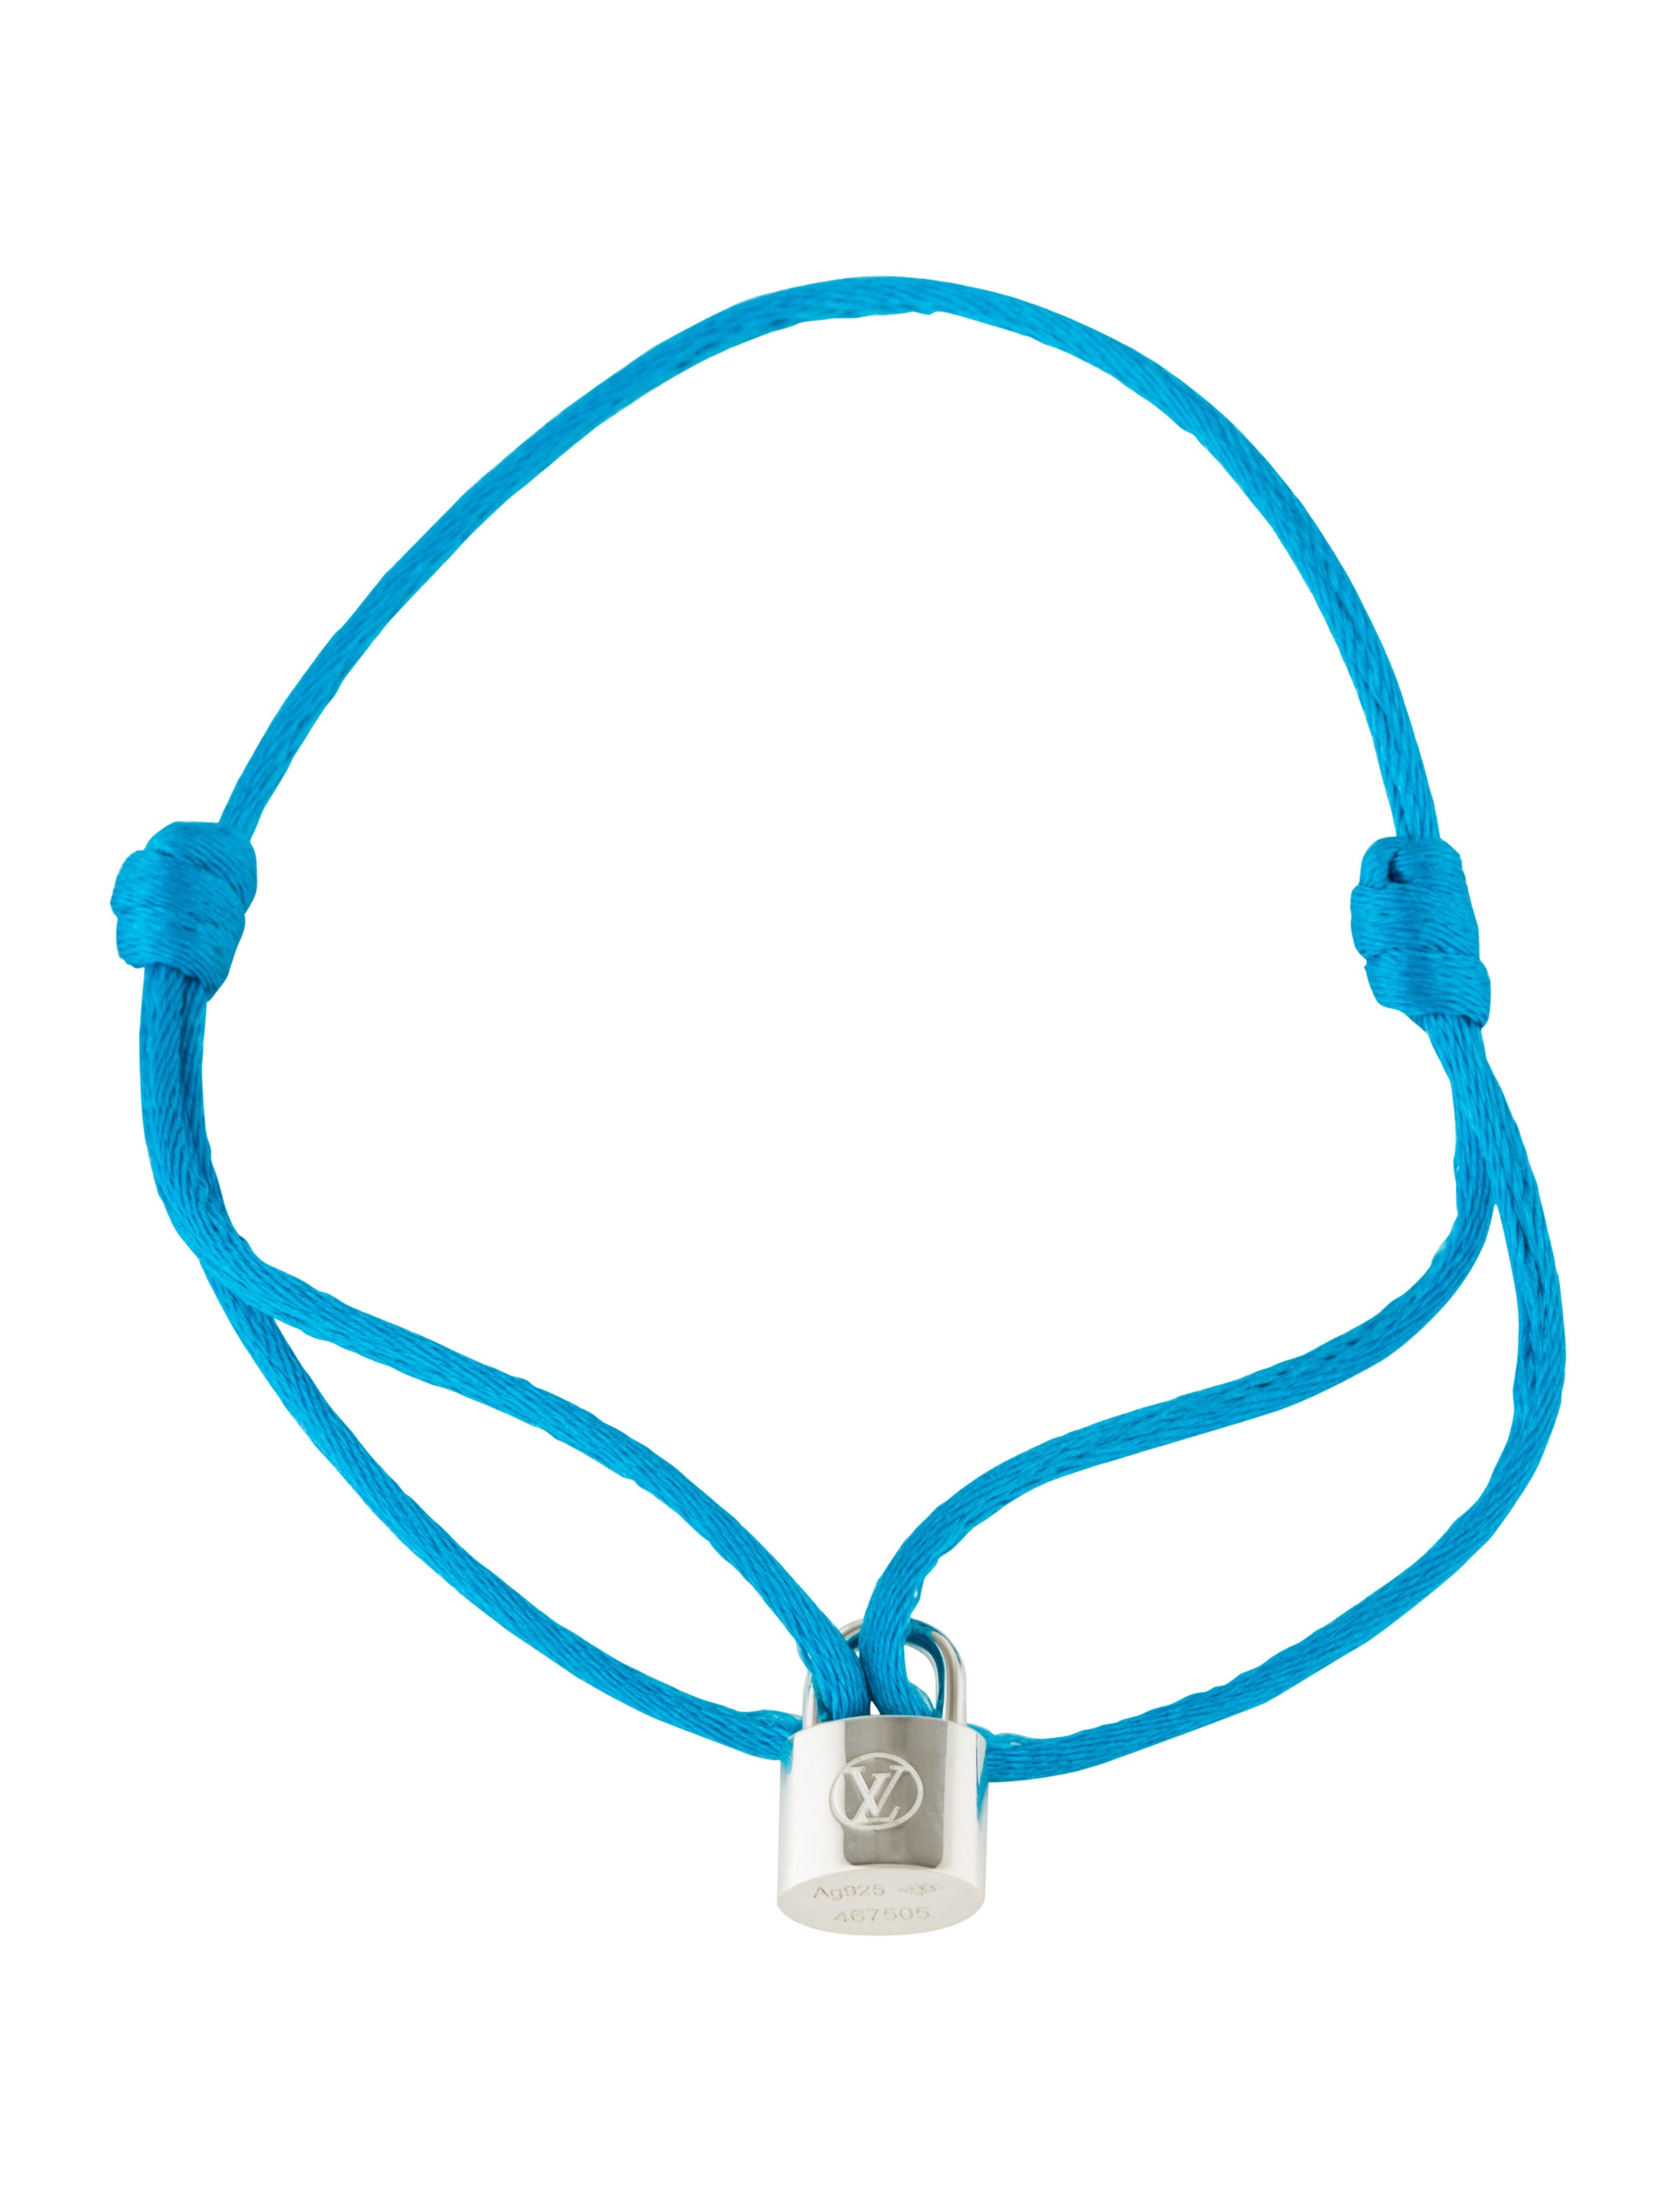 Louis Vuitton Unicef Bracelet Blue Sema Data Co Op